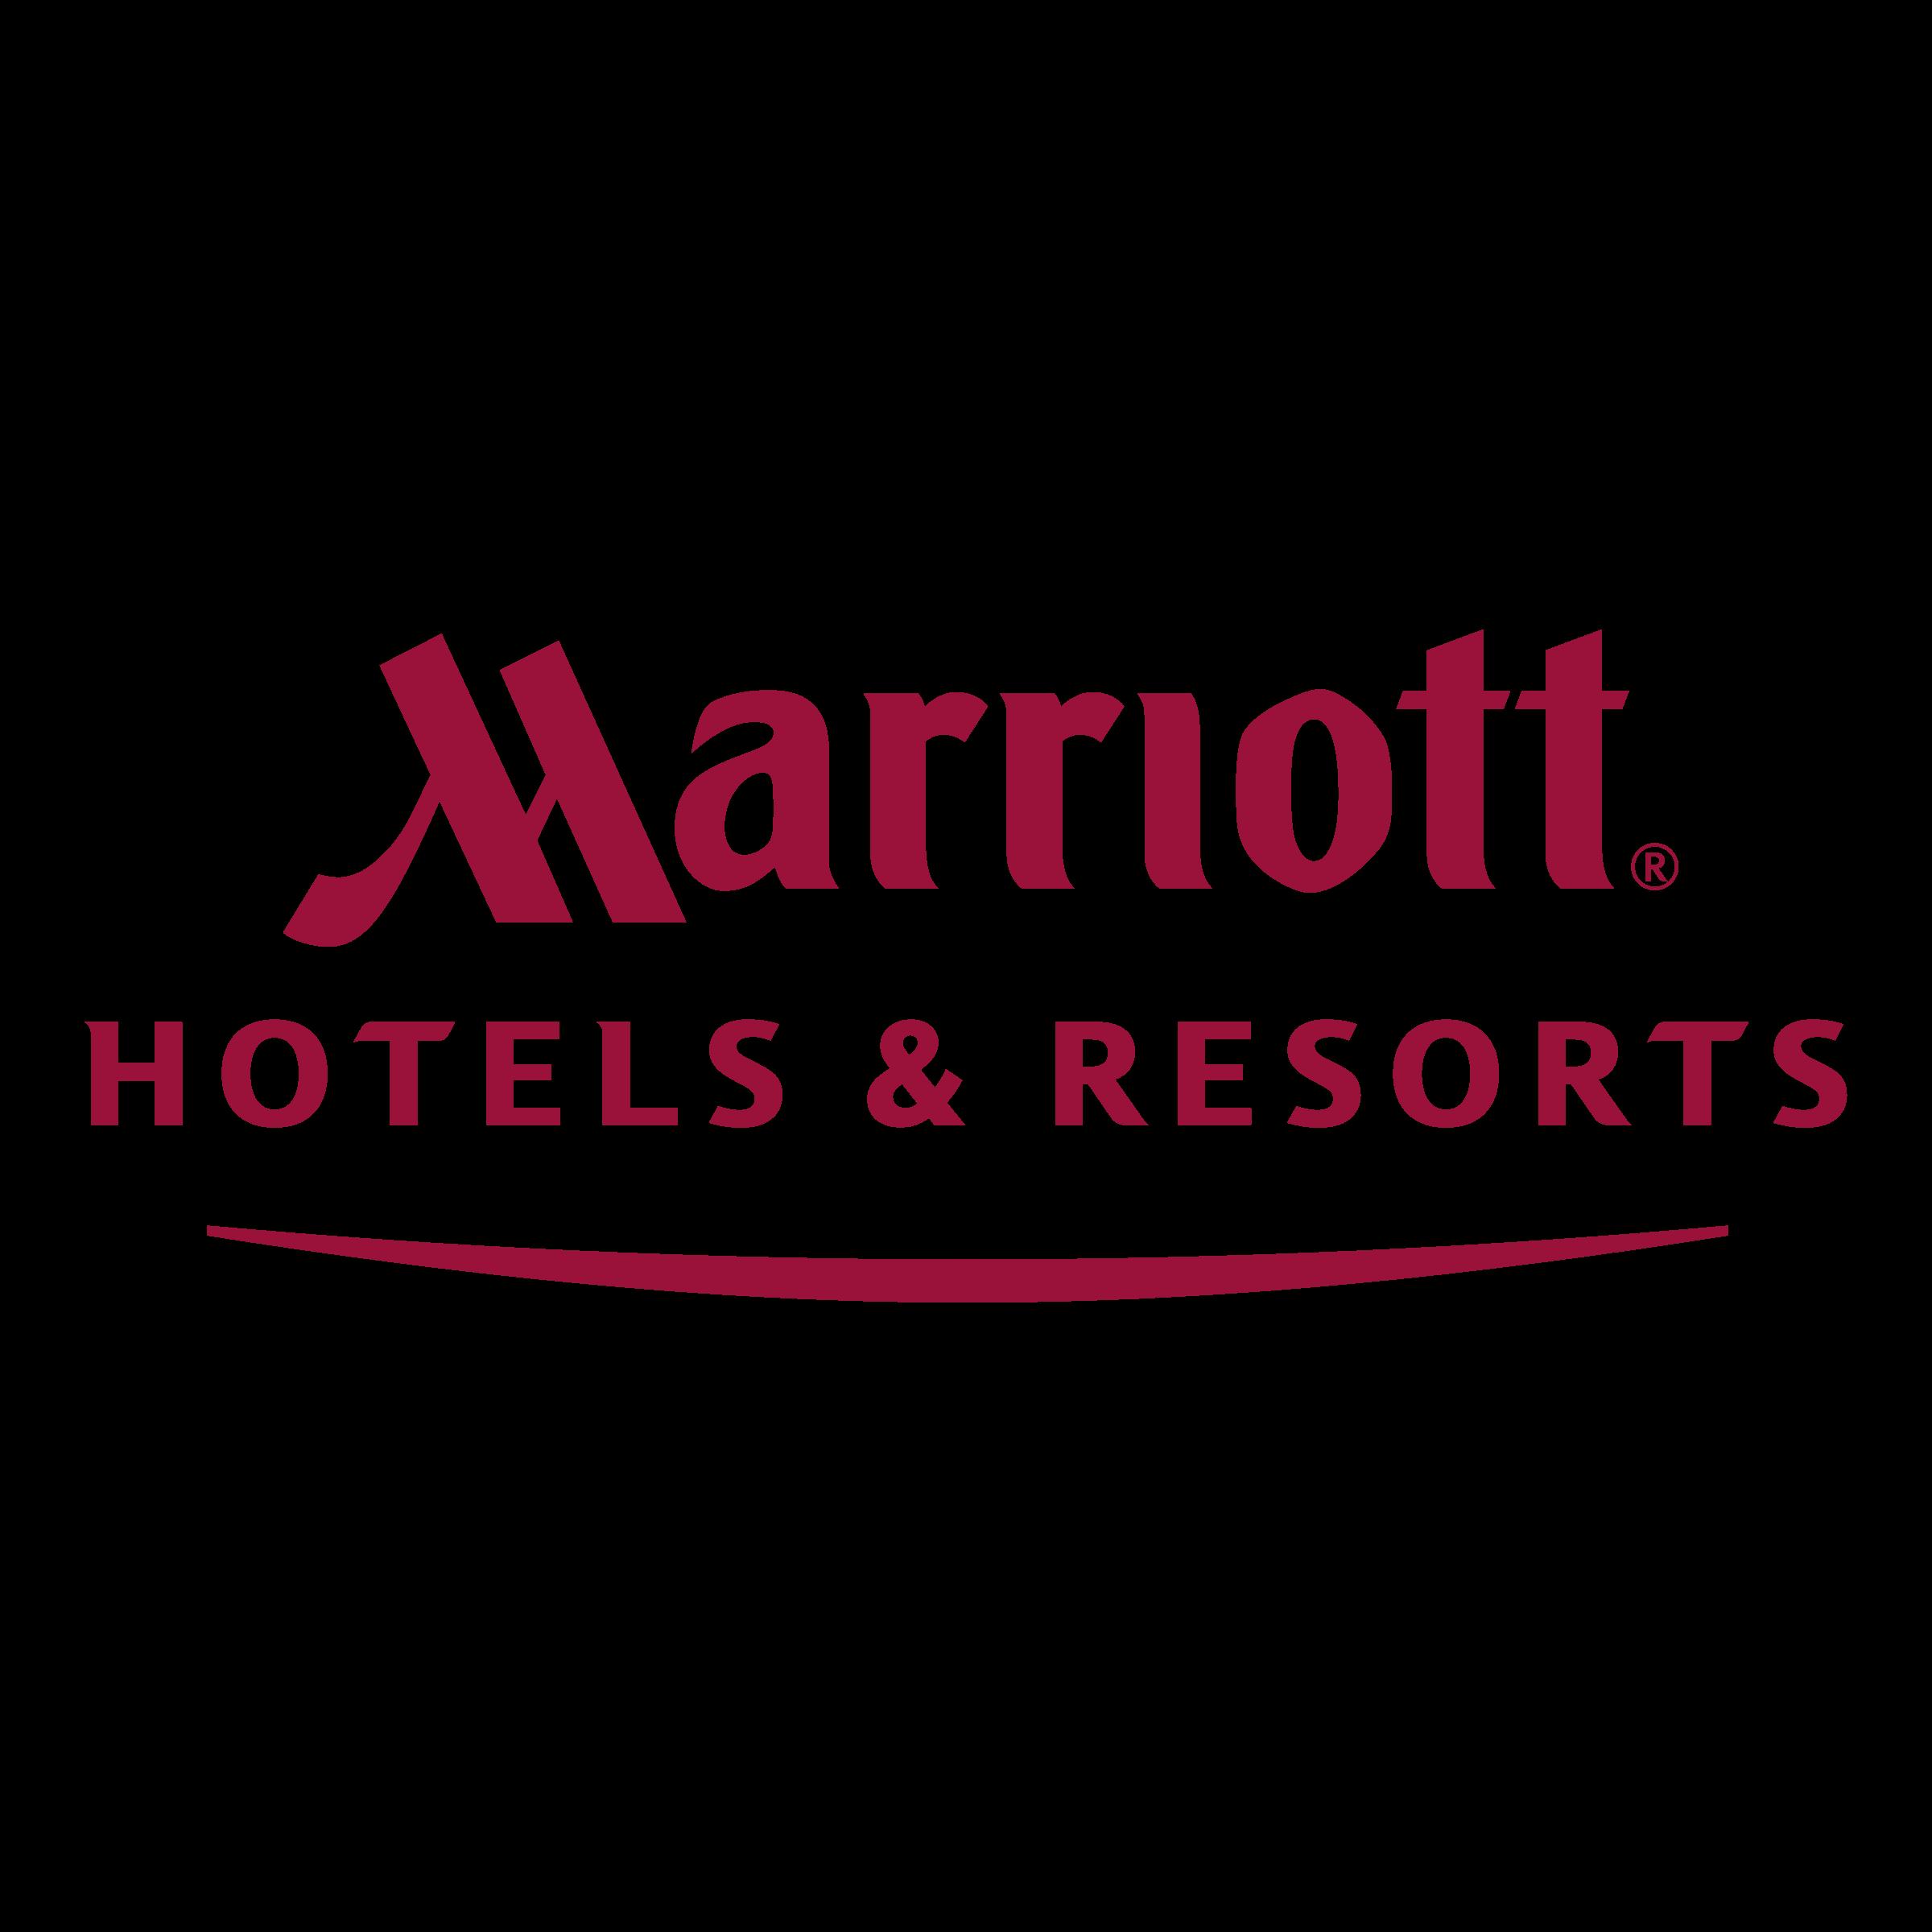 The Marriott Hotels logo